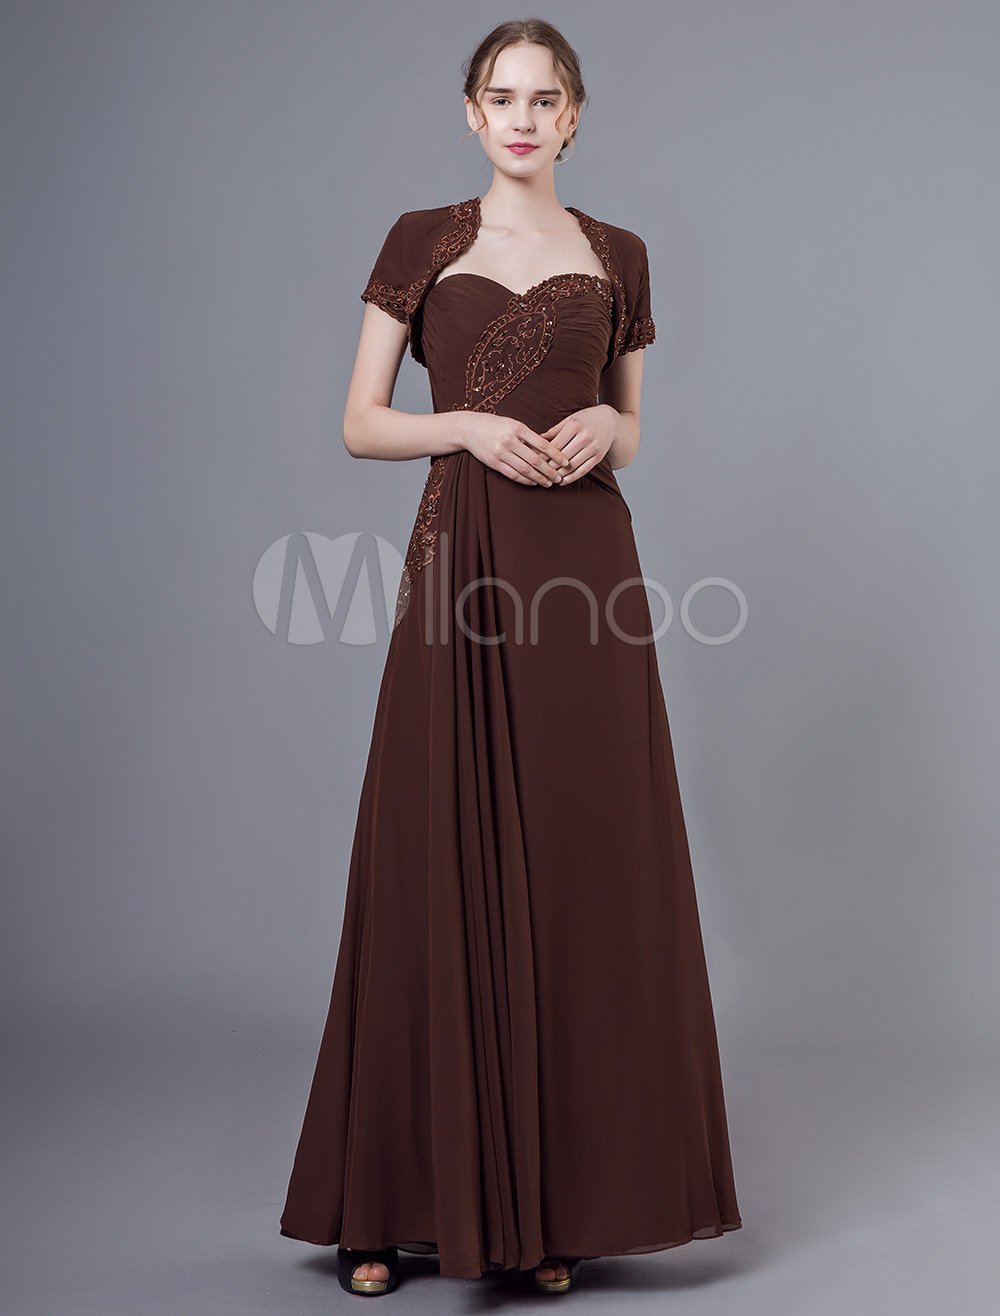 8e52583eab Vestido largo sin tirantes con pliegues de color marrón oscuro plisado  bordado con chaqueta bolero de ...